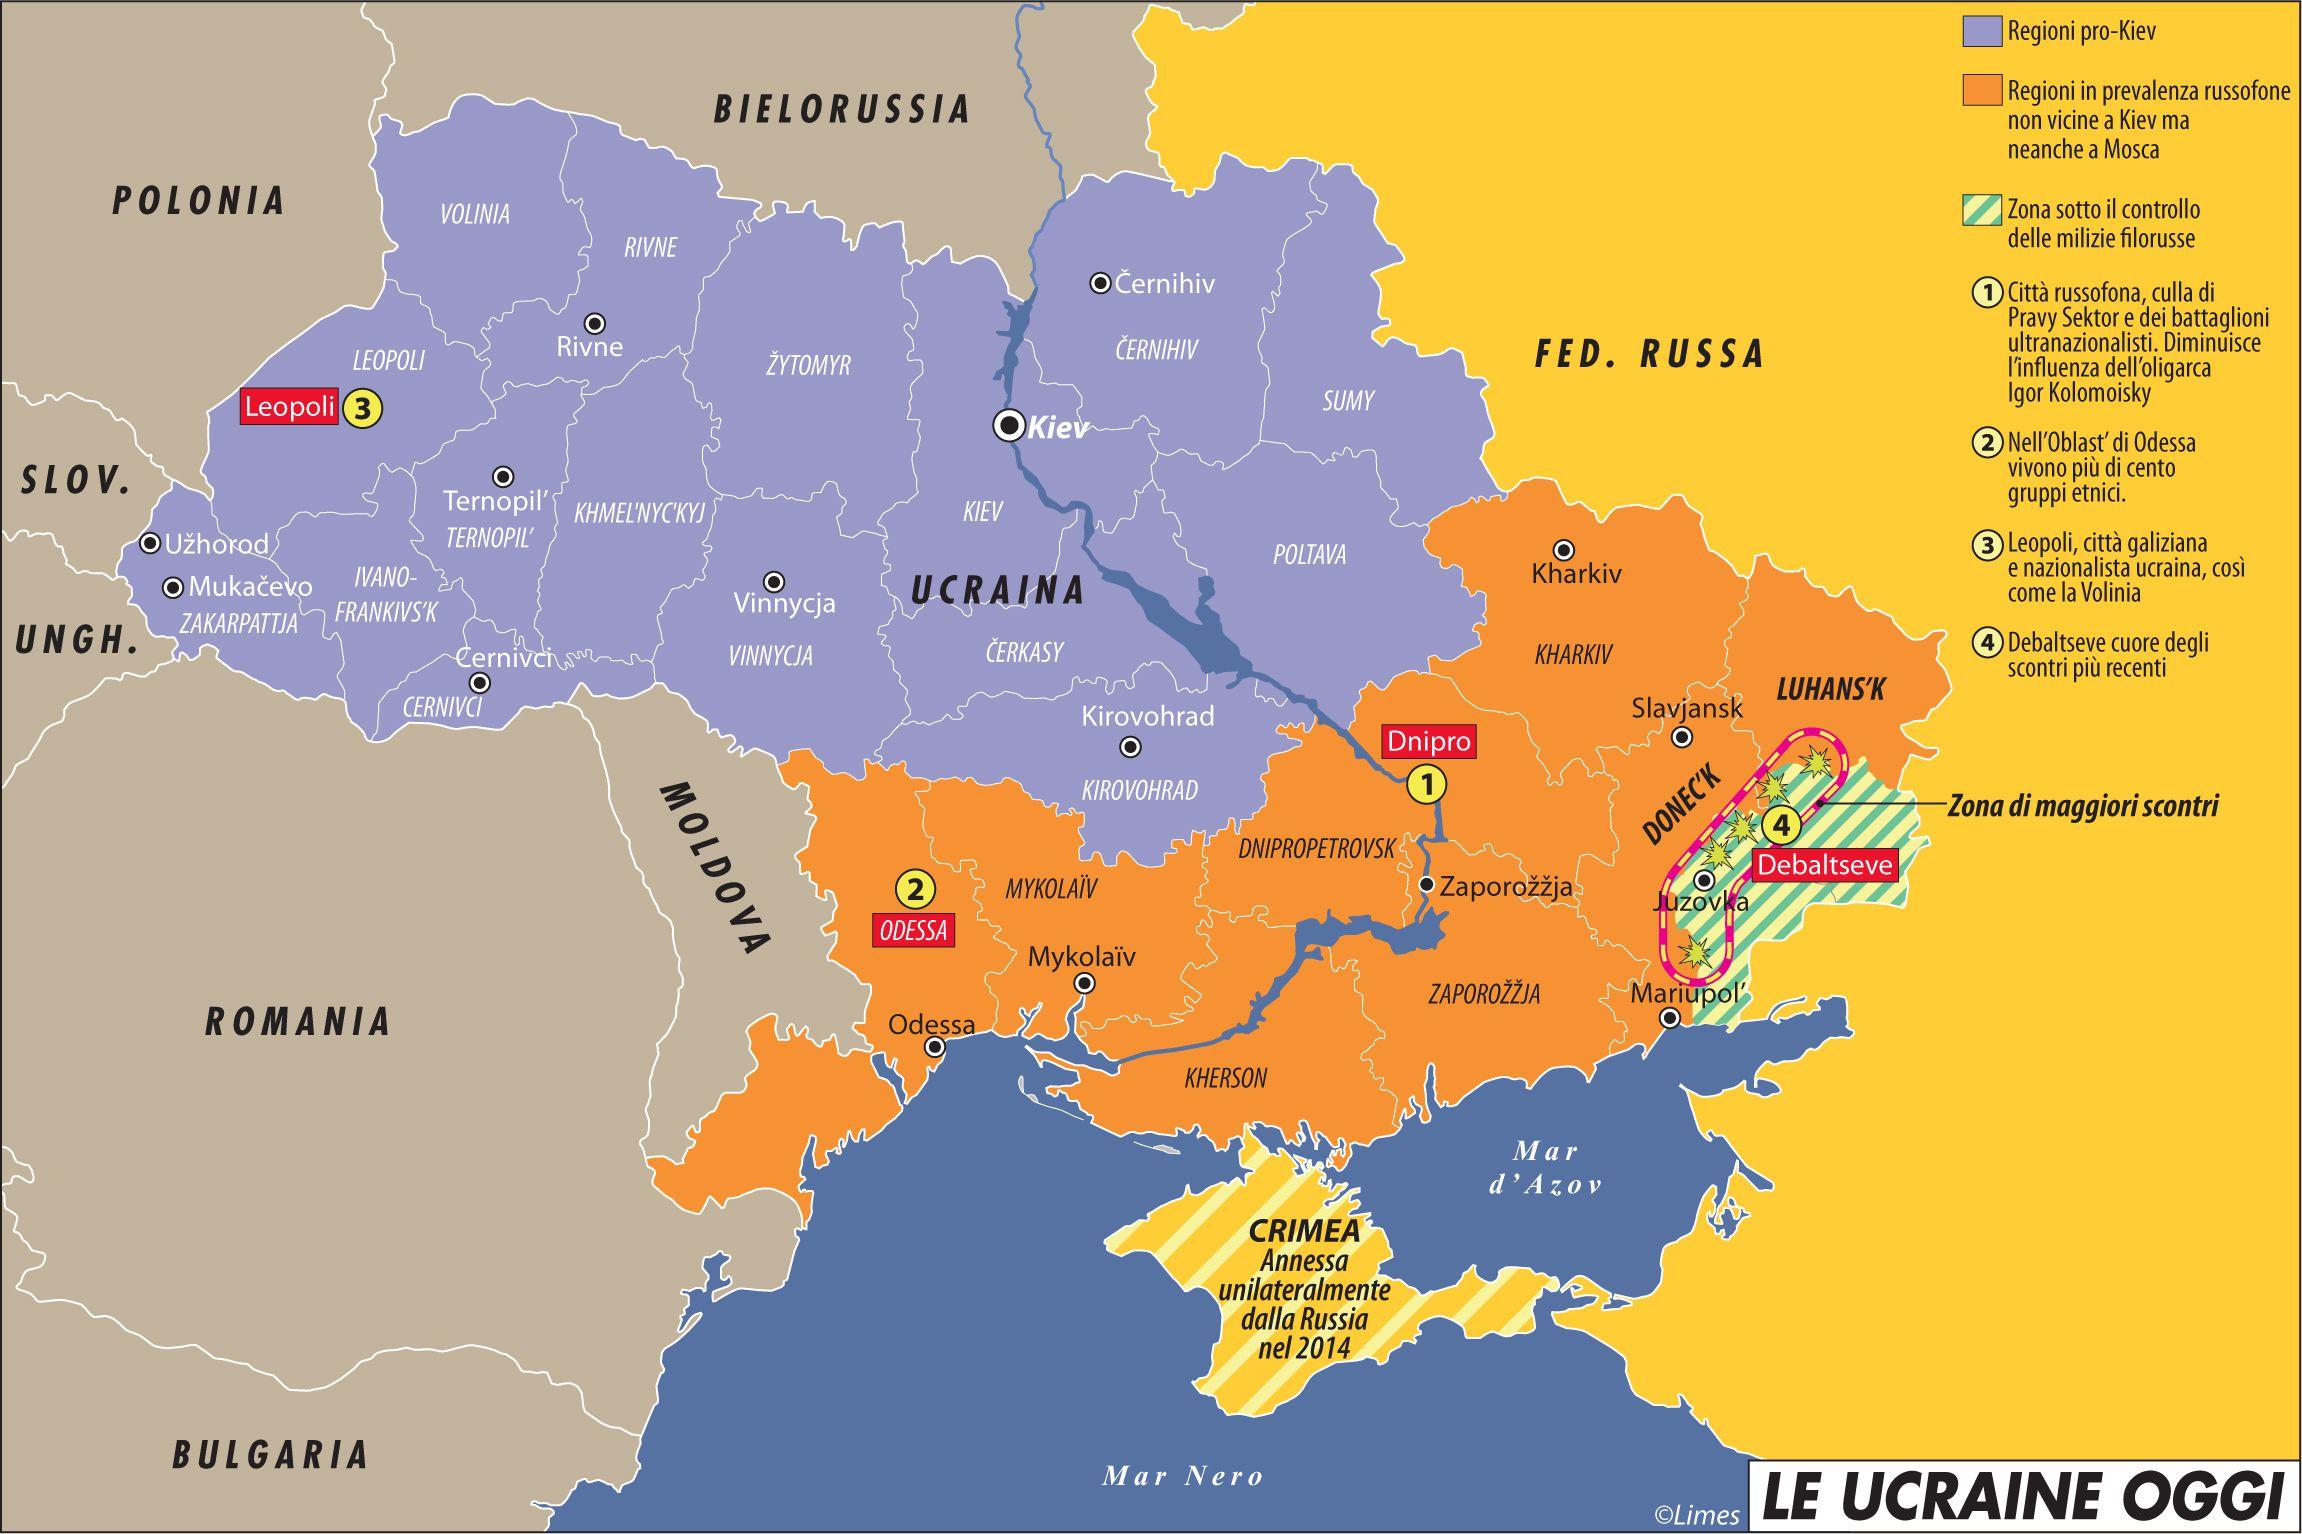 Cantone 2 Le Ucraine oggi copia